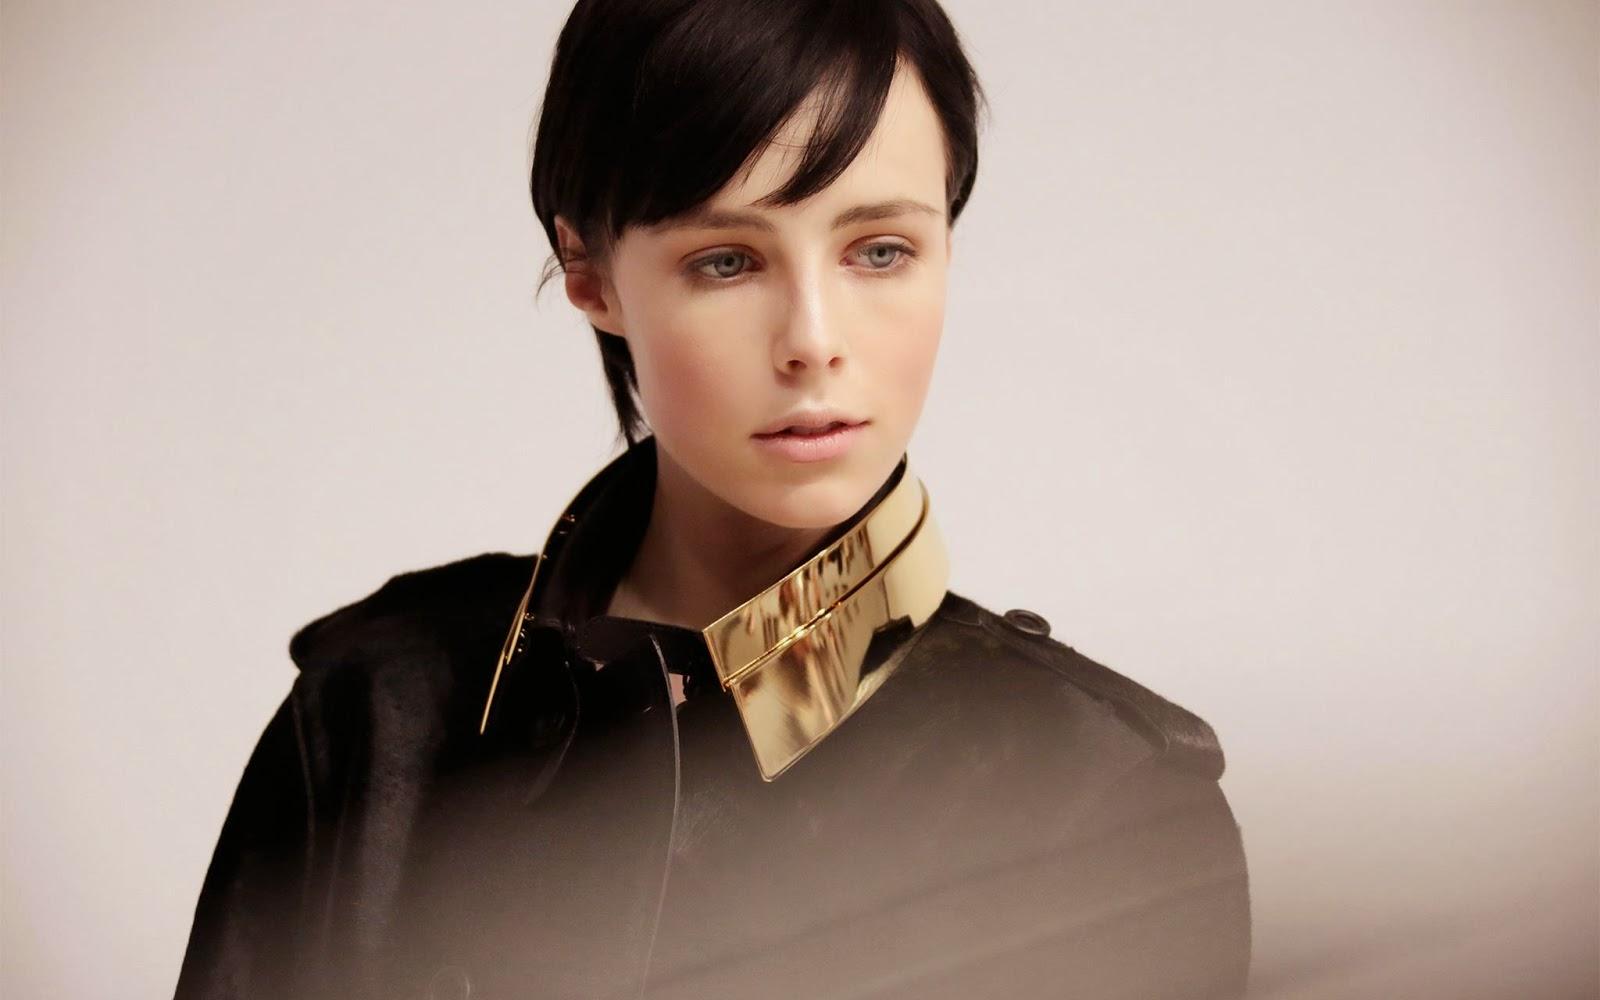 Top 5 UK Models Blogs